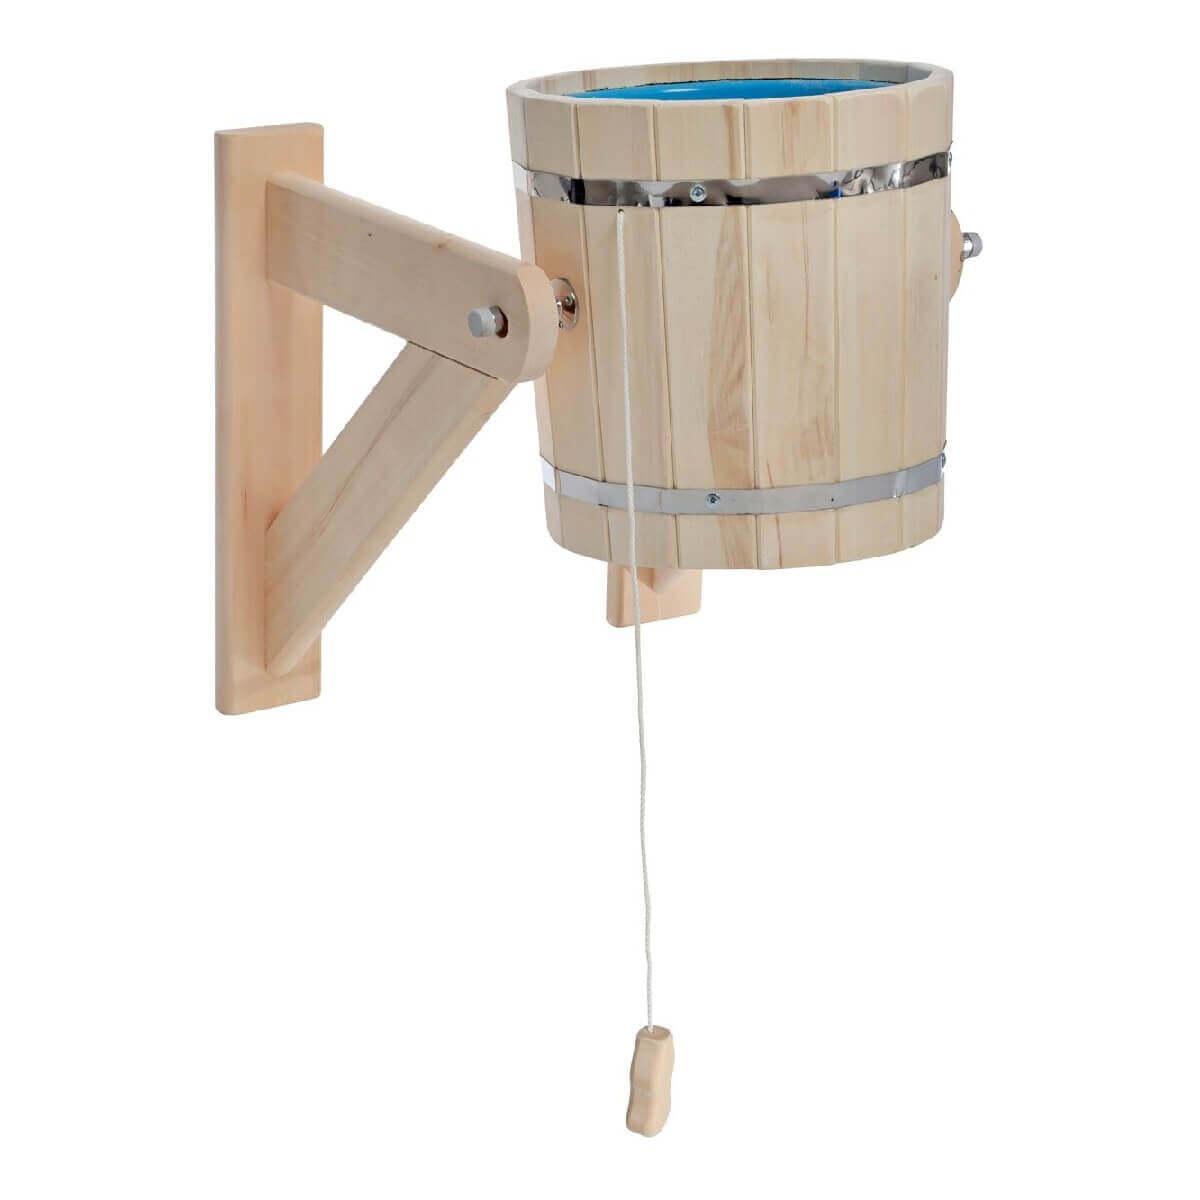 Обливное устройство для бани – закаливаемся